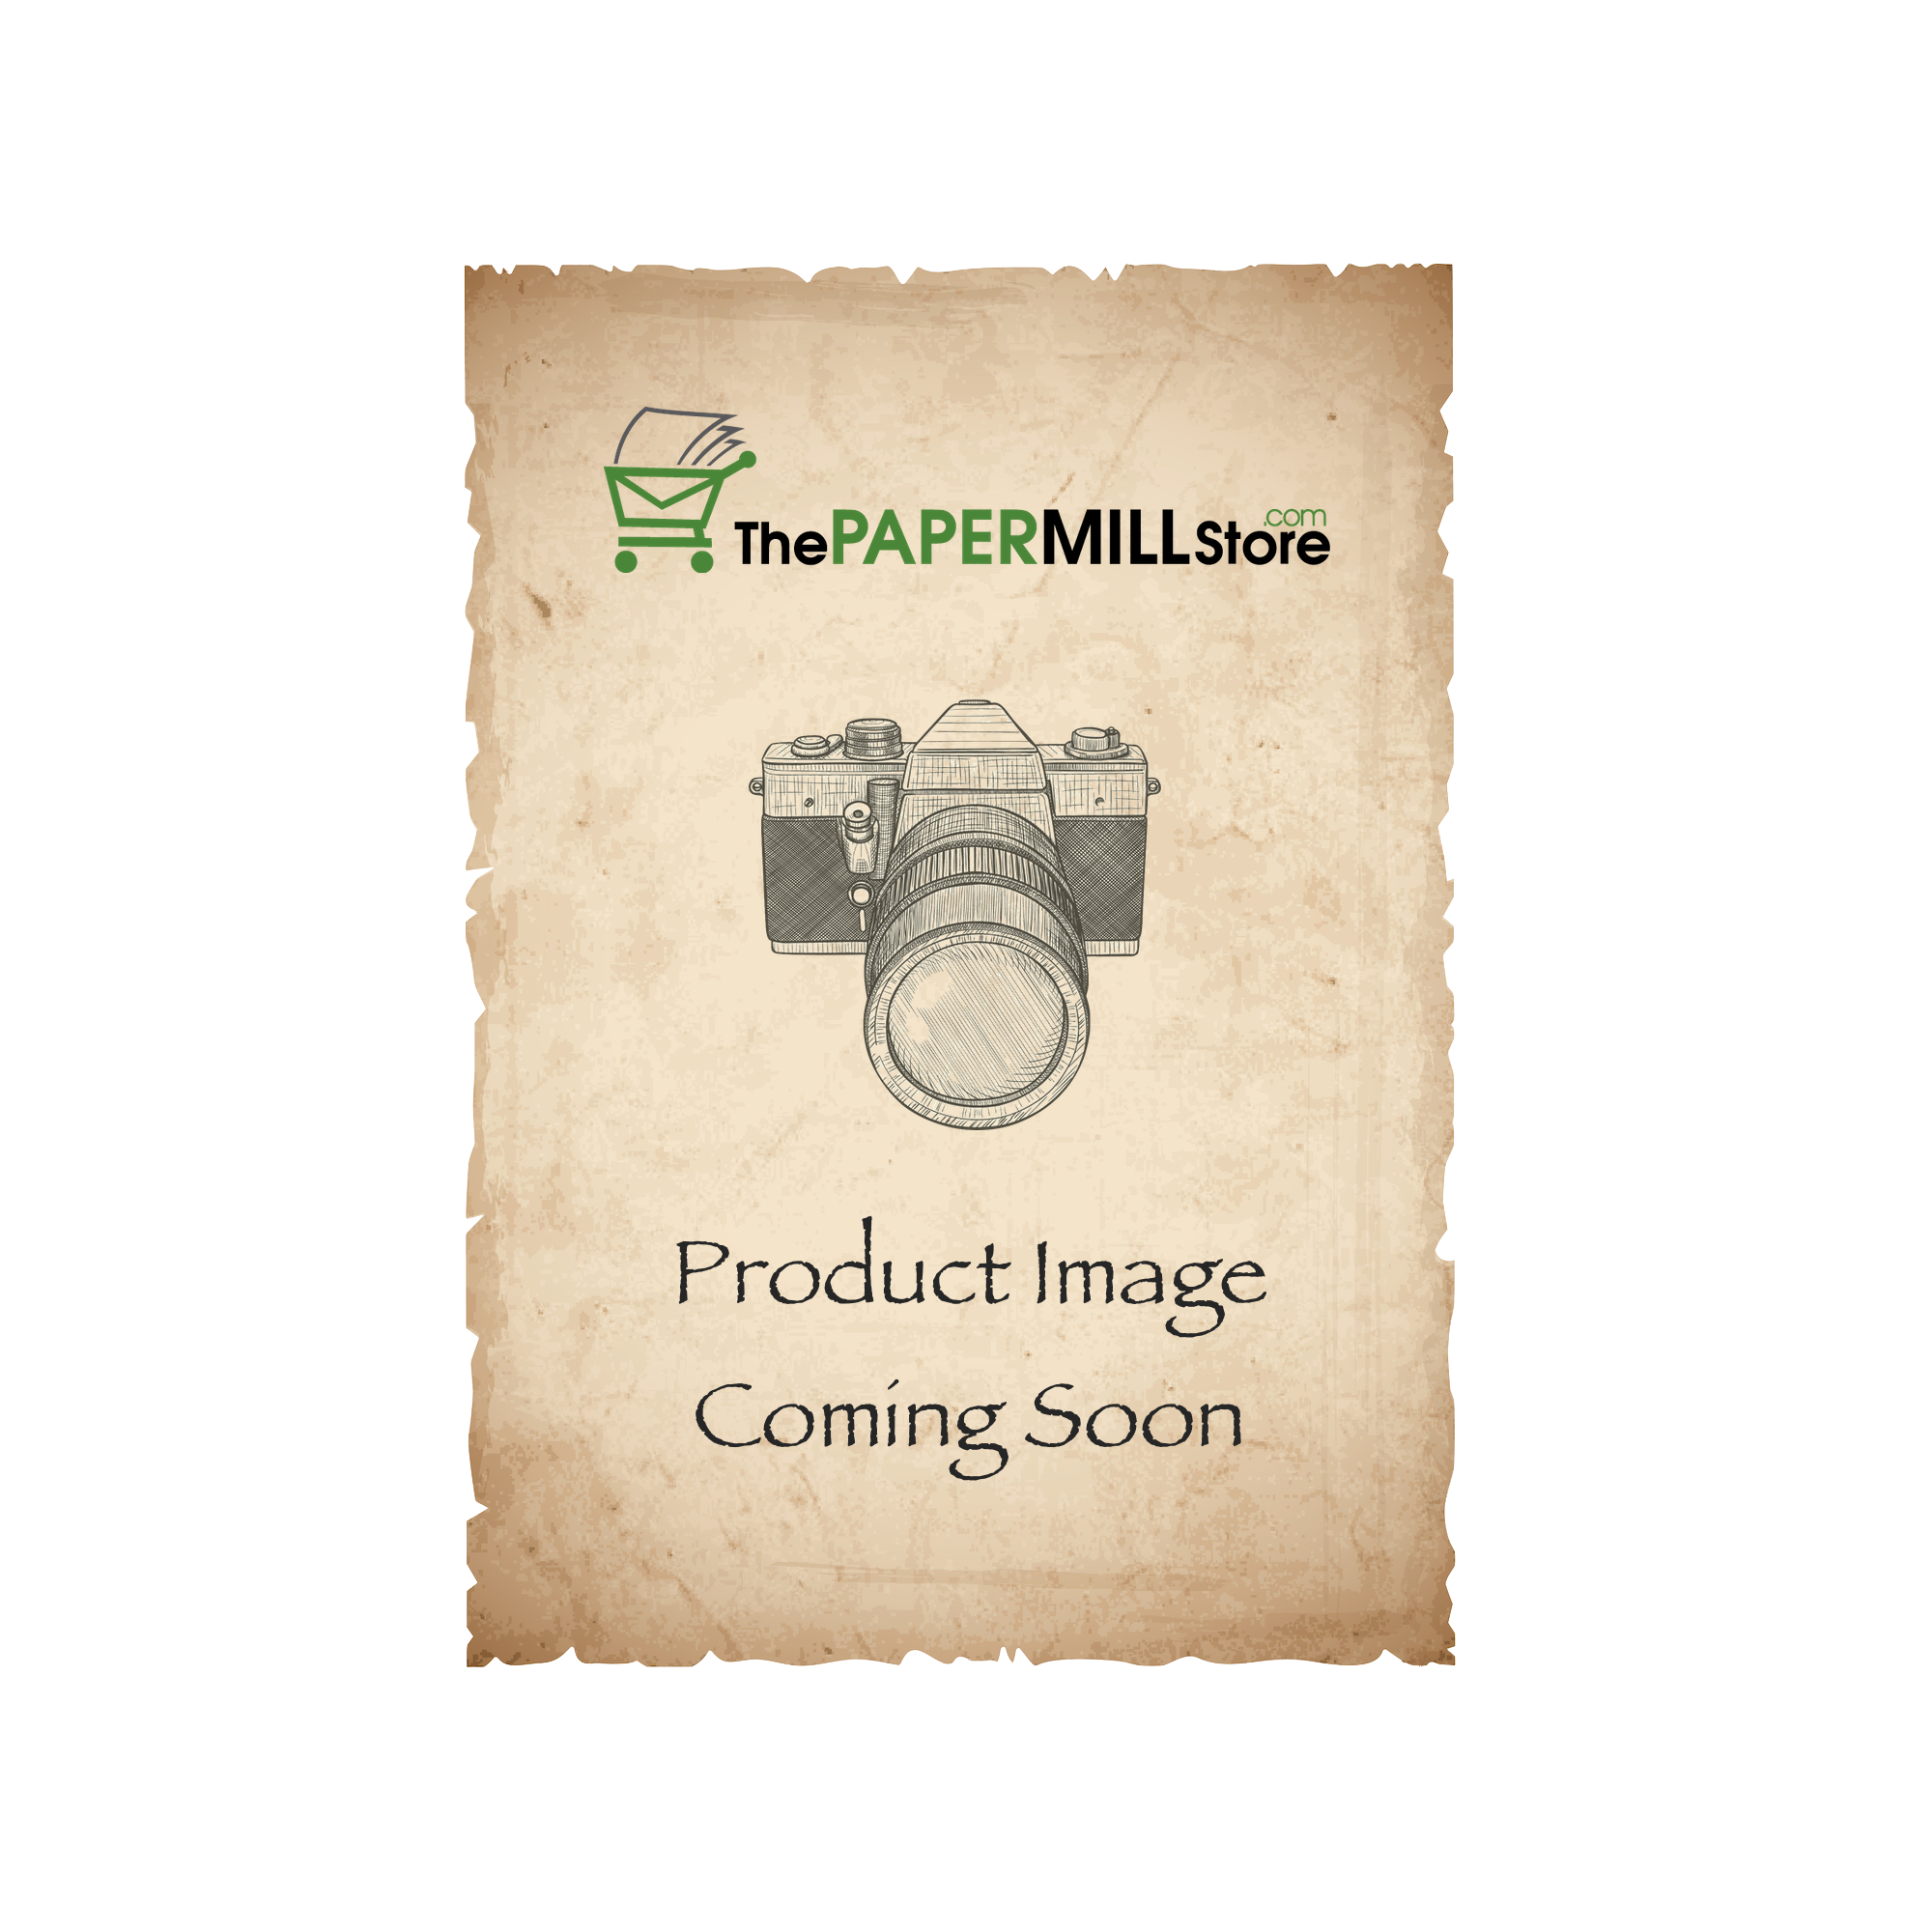 Loop Antique Vellum Chili Envelopes - A2 (4 3/8 x 5 3/4) 80 lb Text Antique Vellum  50% Recycled 250 per Box